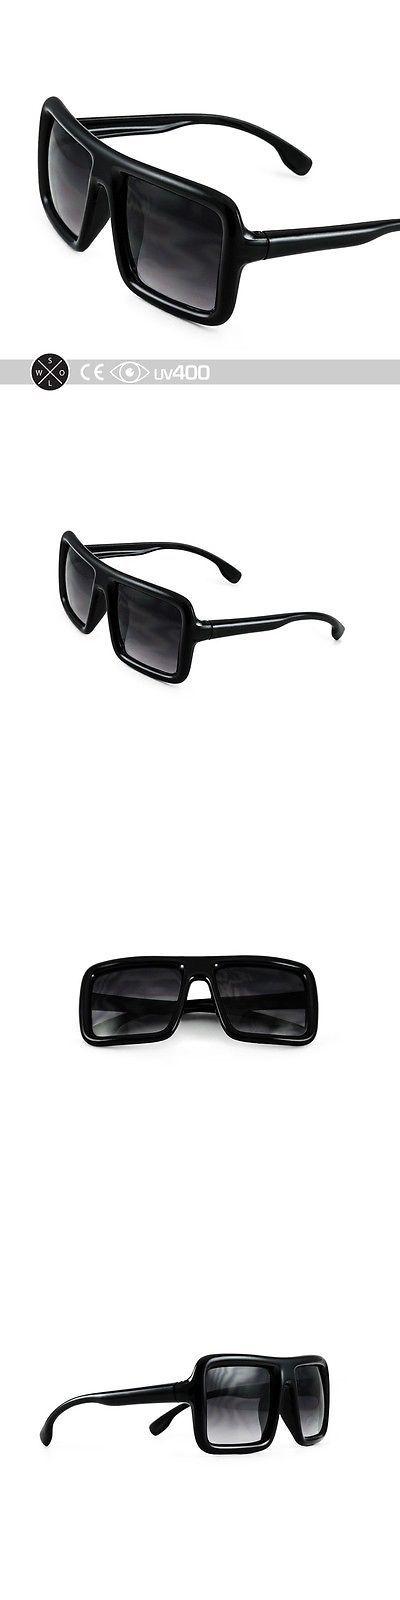 Sunglasses 131411: Black Old School Block Square Retro Kid Sunglasses Dj Child Children K003 -> BUY IT NOW ONLY: $500 on eBay!